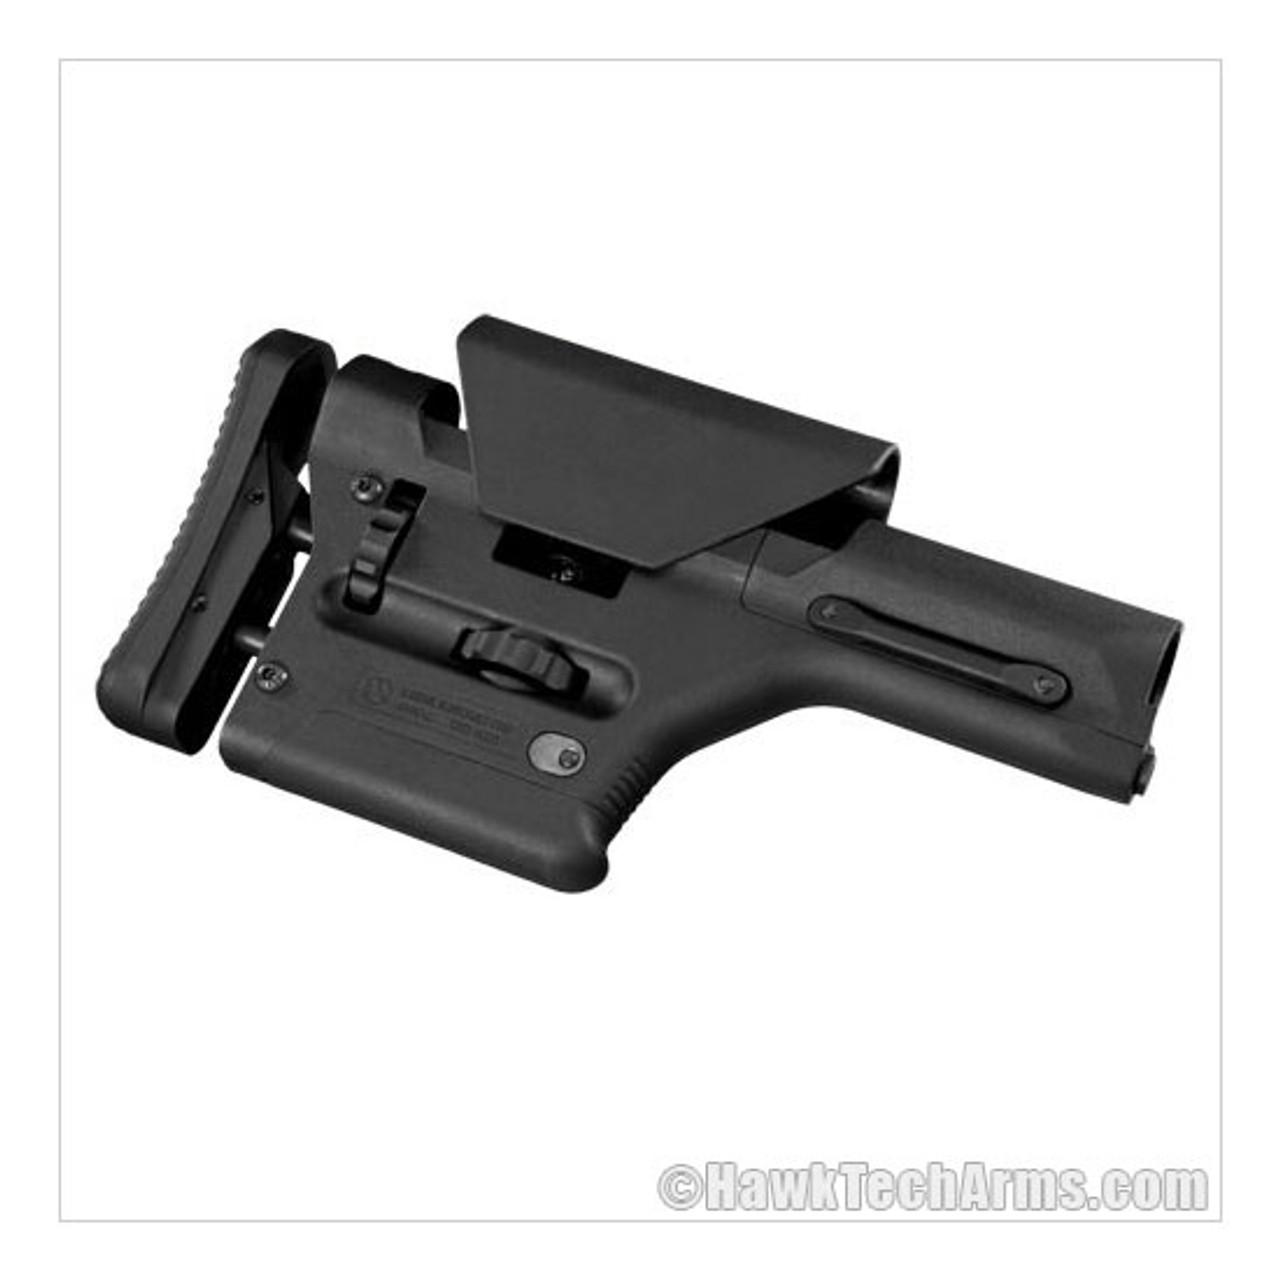 Magpul - PRS Rifle Stock - Black